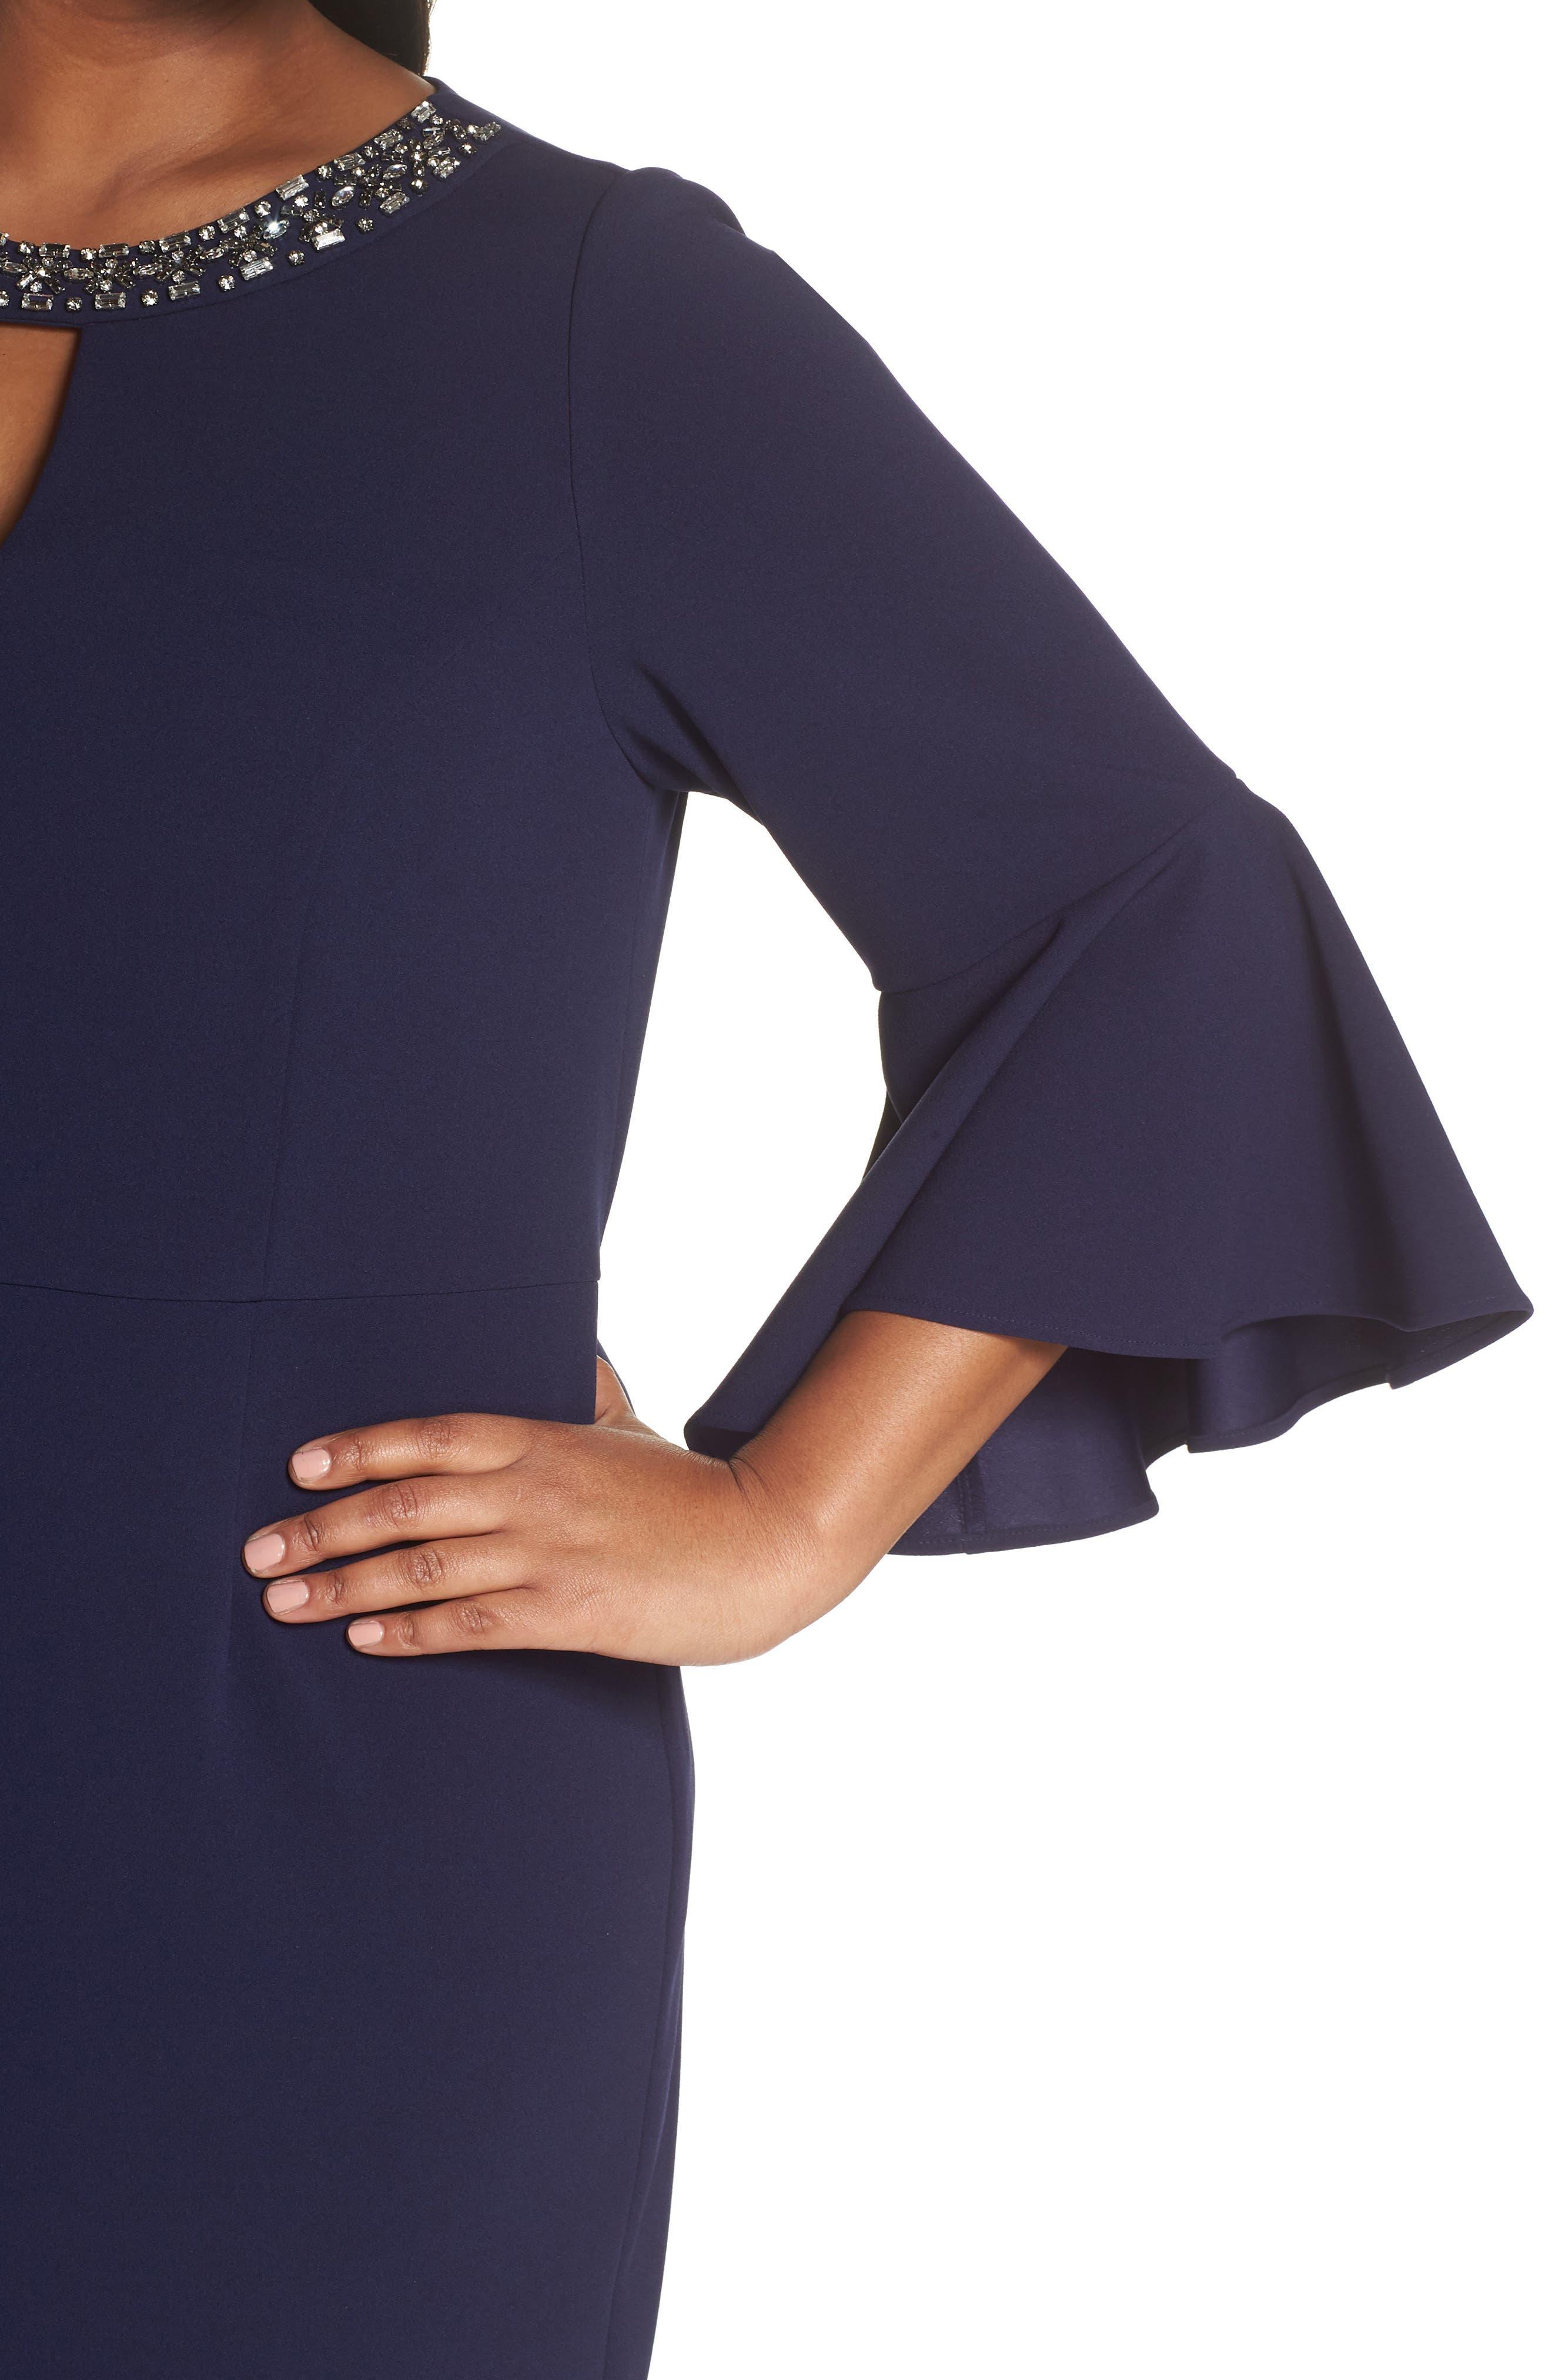 VINCE CAMUTO, Embellished Neck Sheath Dress, Alternate thumbnail 5, color, NAVY